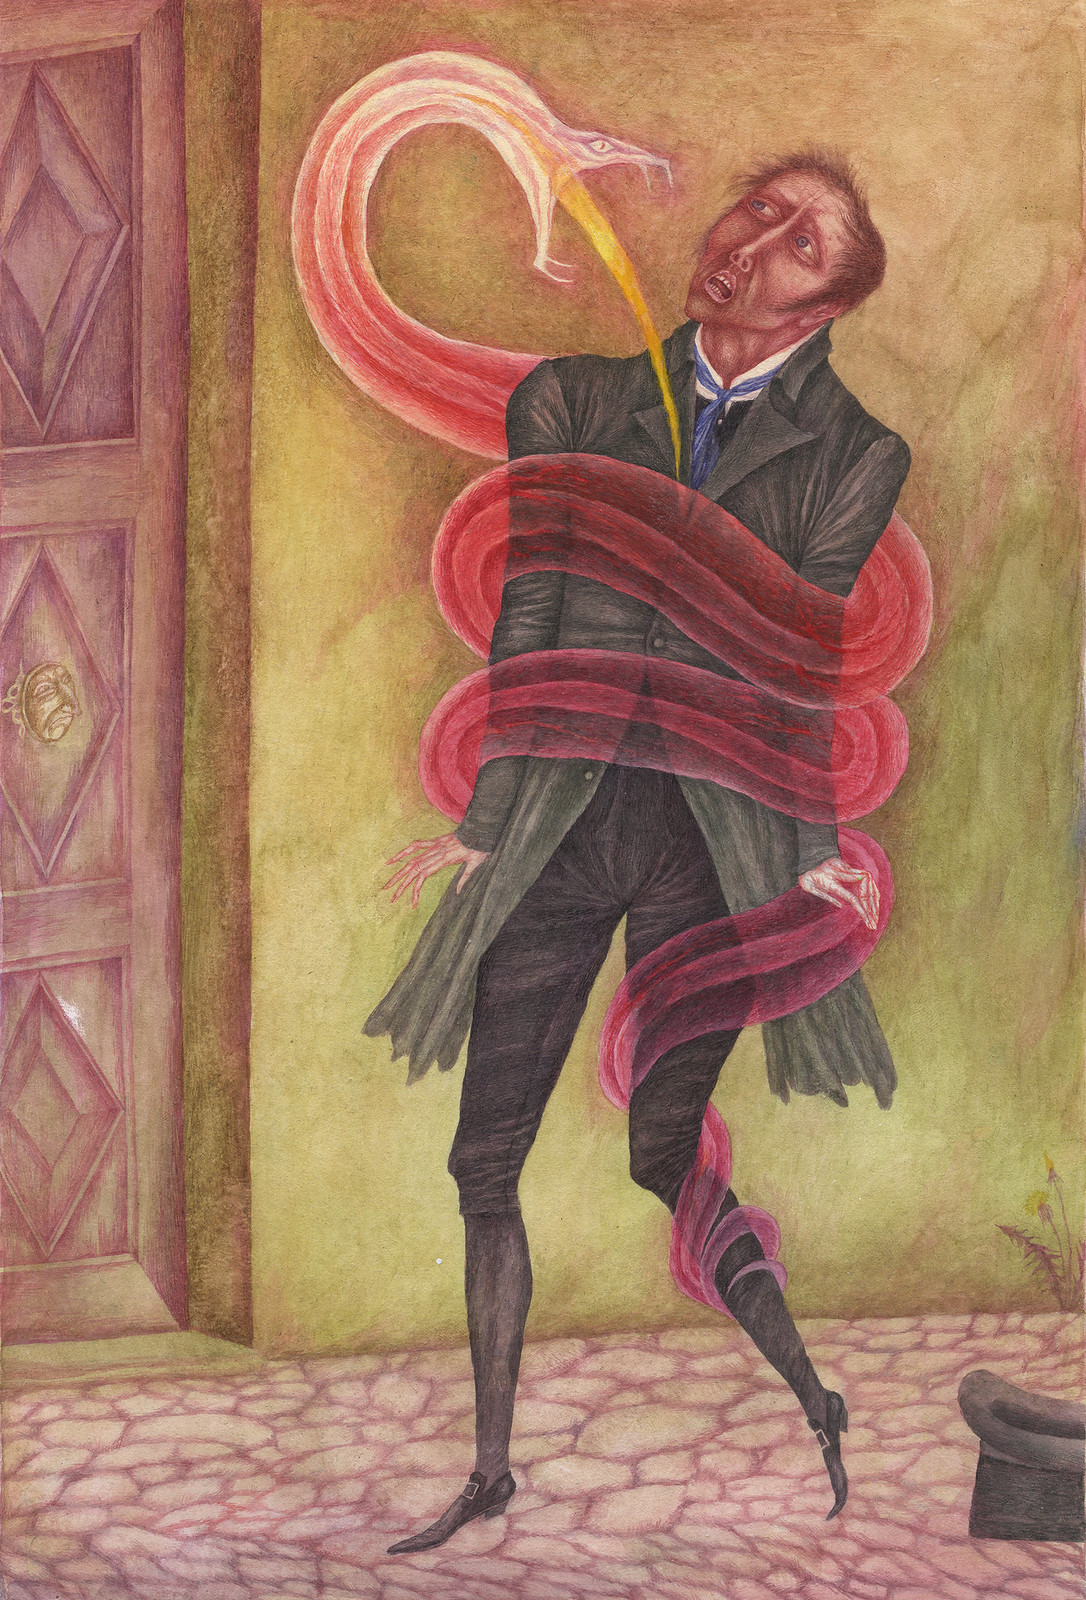 Jindra Capek - The Golden Pot, Illustration 2